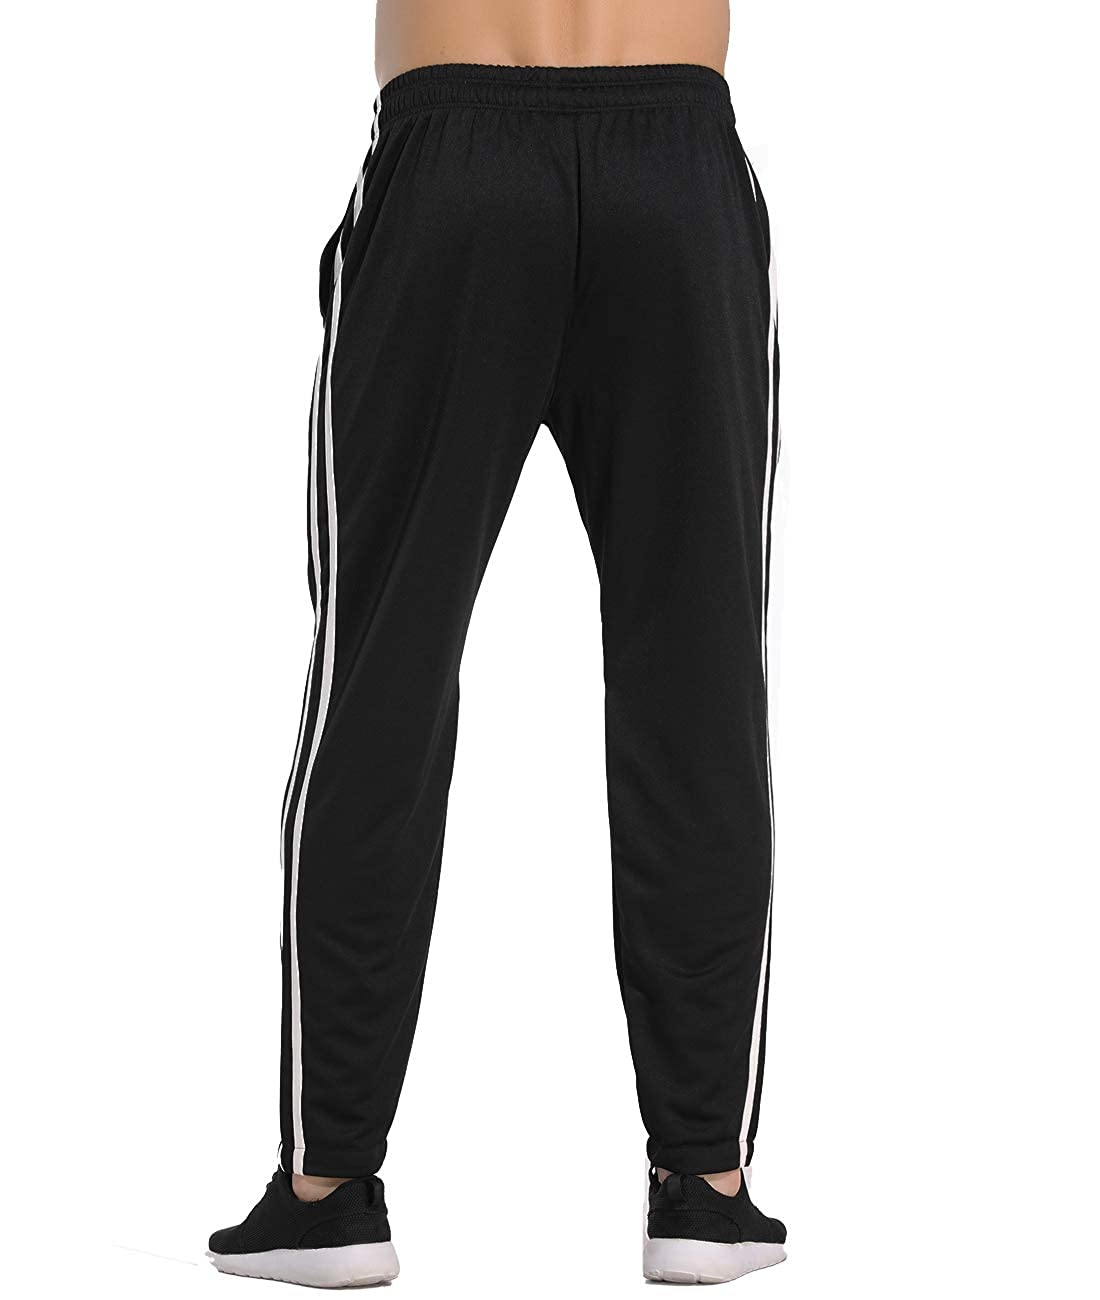 CROSS1946 Mens Joggers Track Pants Athletic Running Jogging Bottoms Multi Pockets Loose Fit Sweatpants